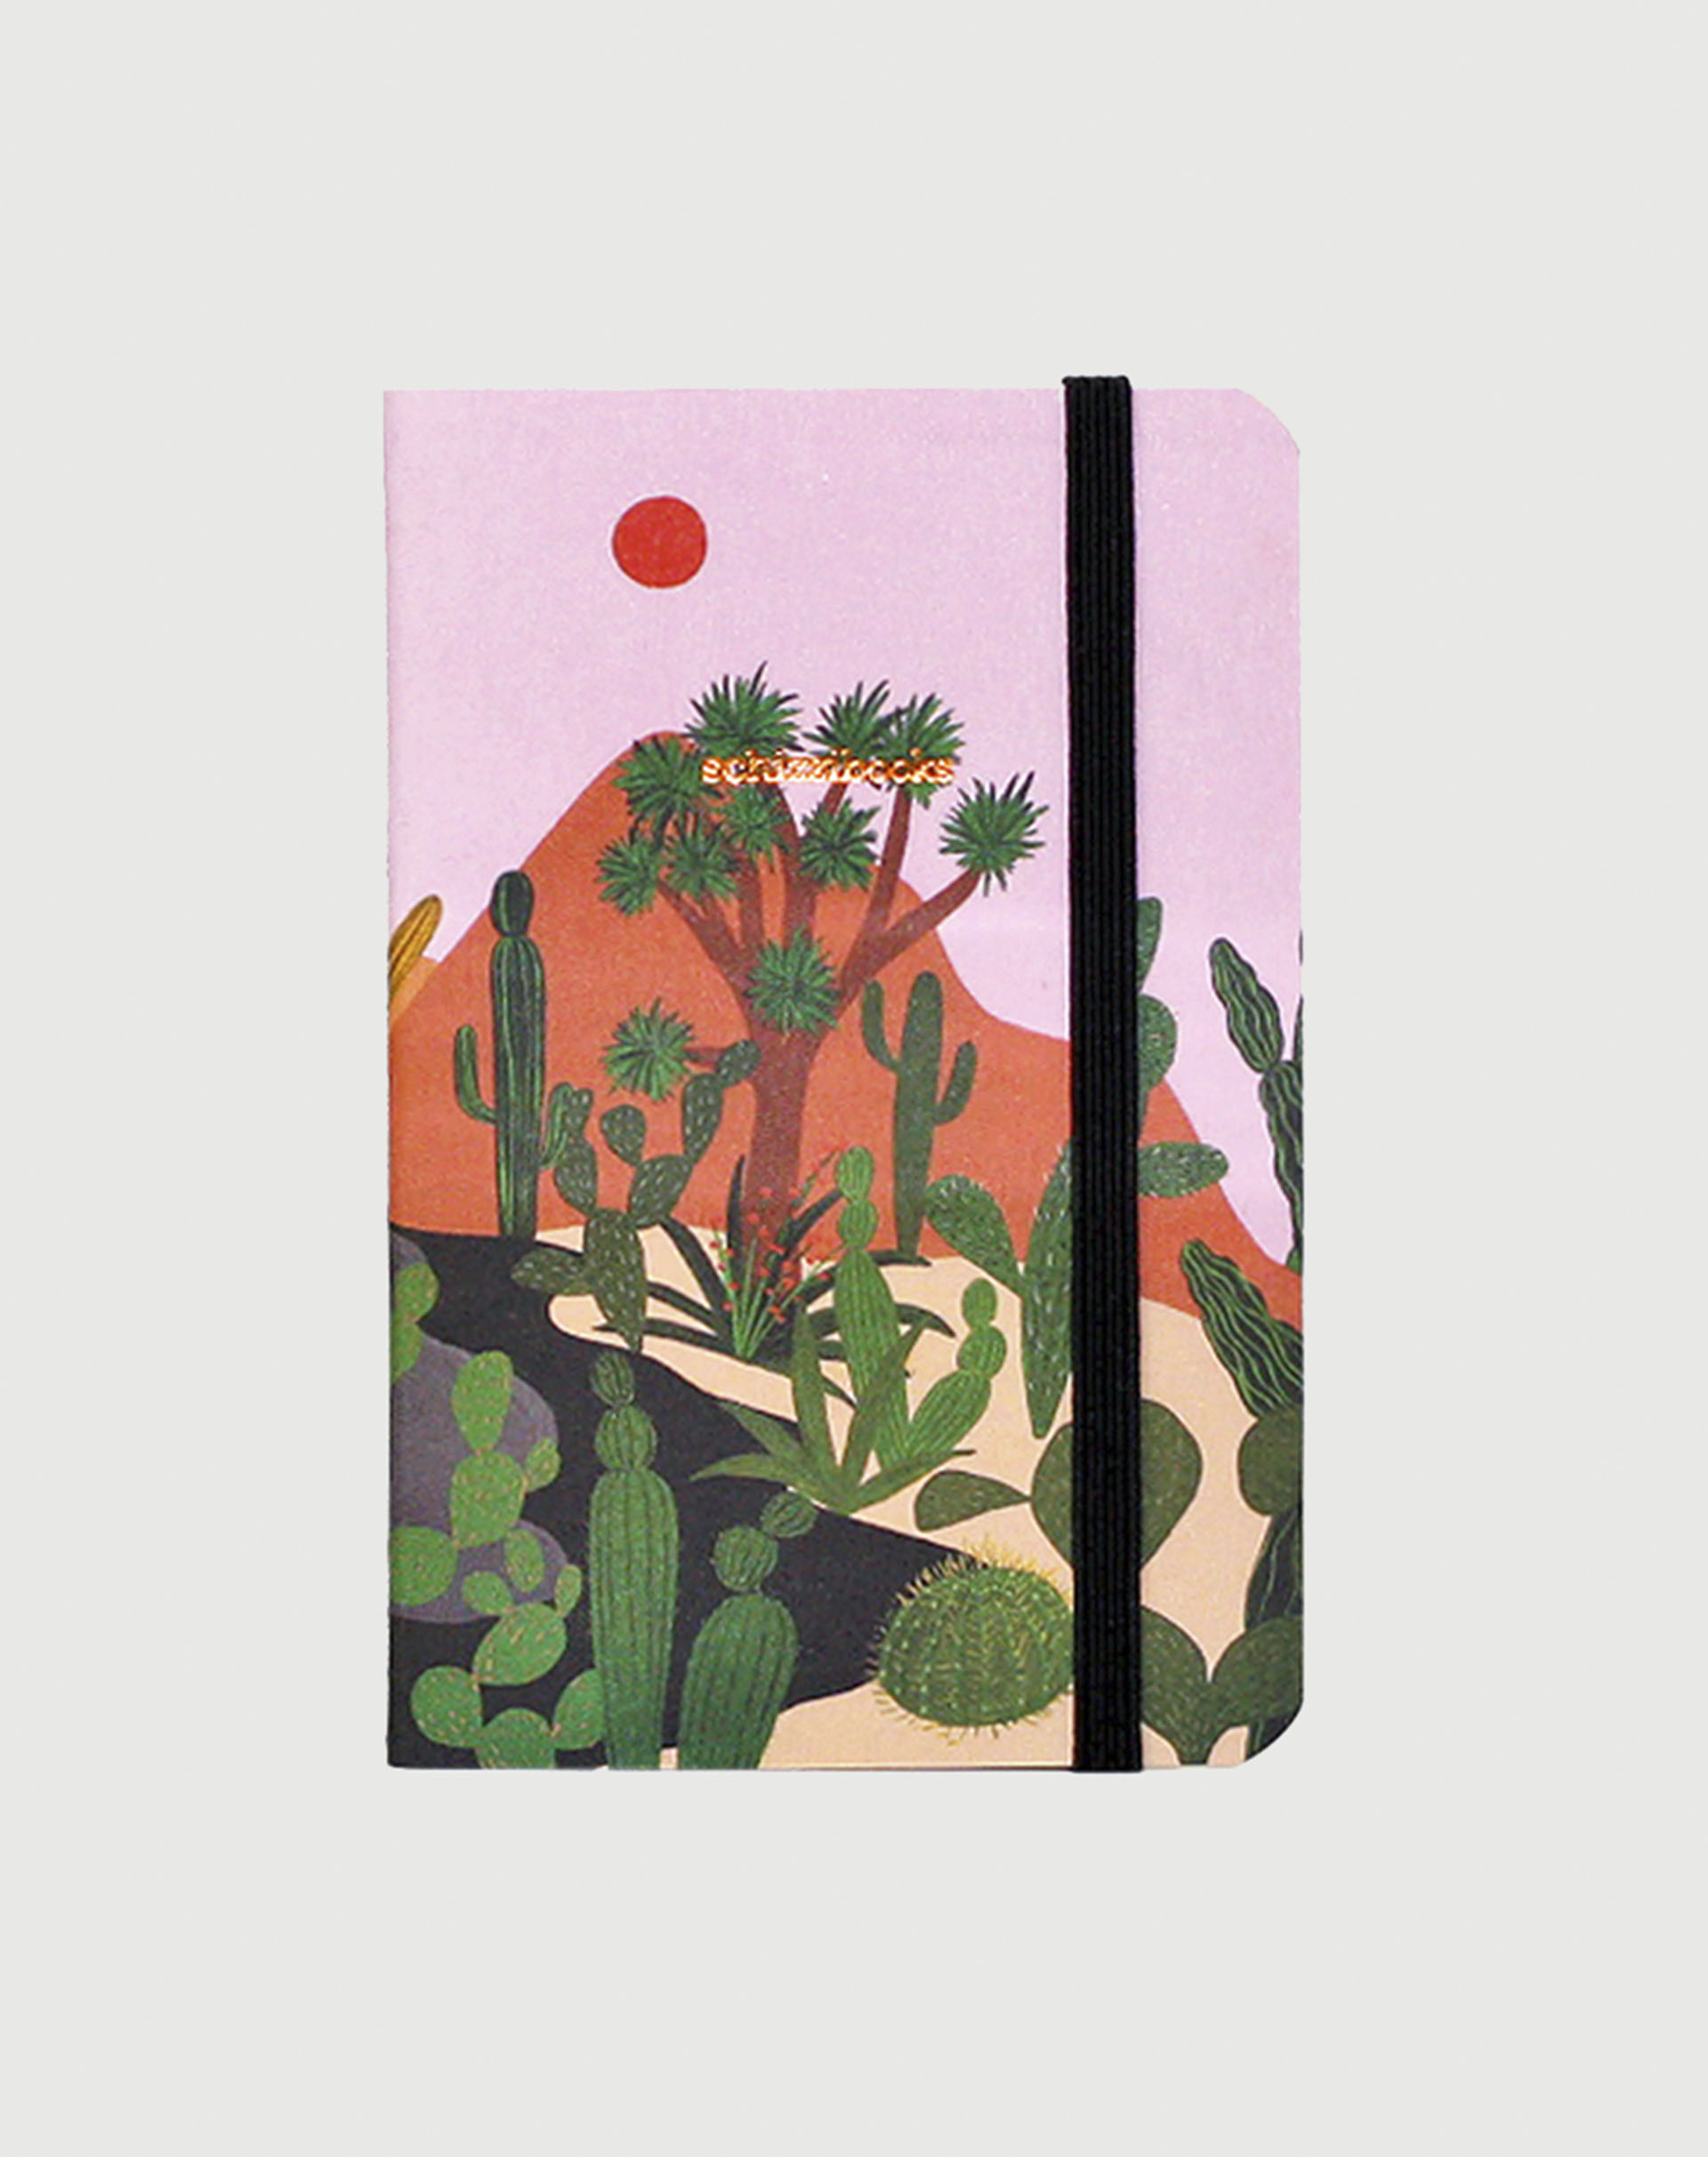 AMARO Feminino SCHIZZIBOOKS SKETCHBOOK POCKET, JOSHUA